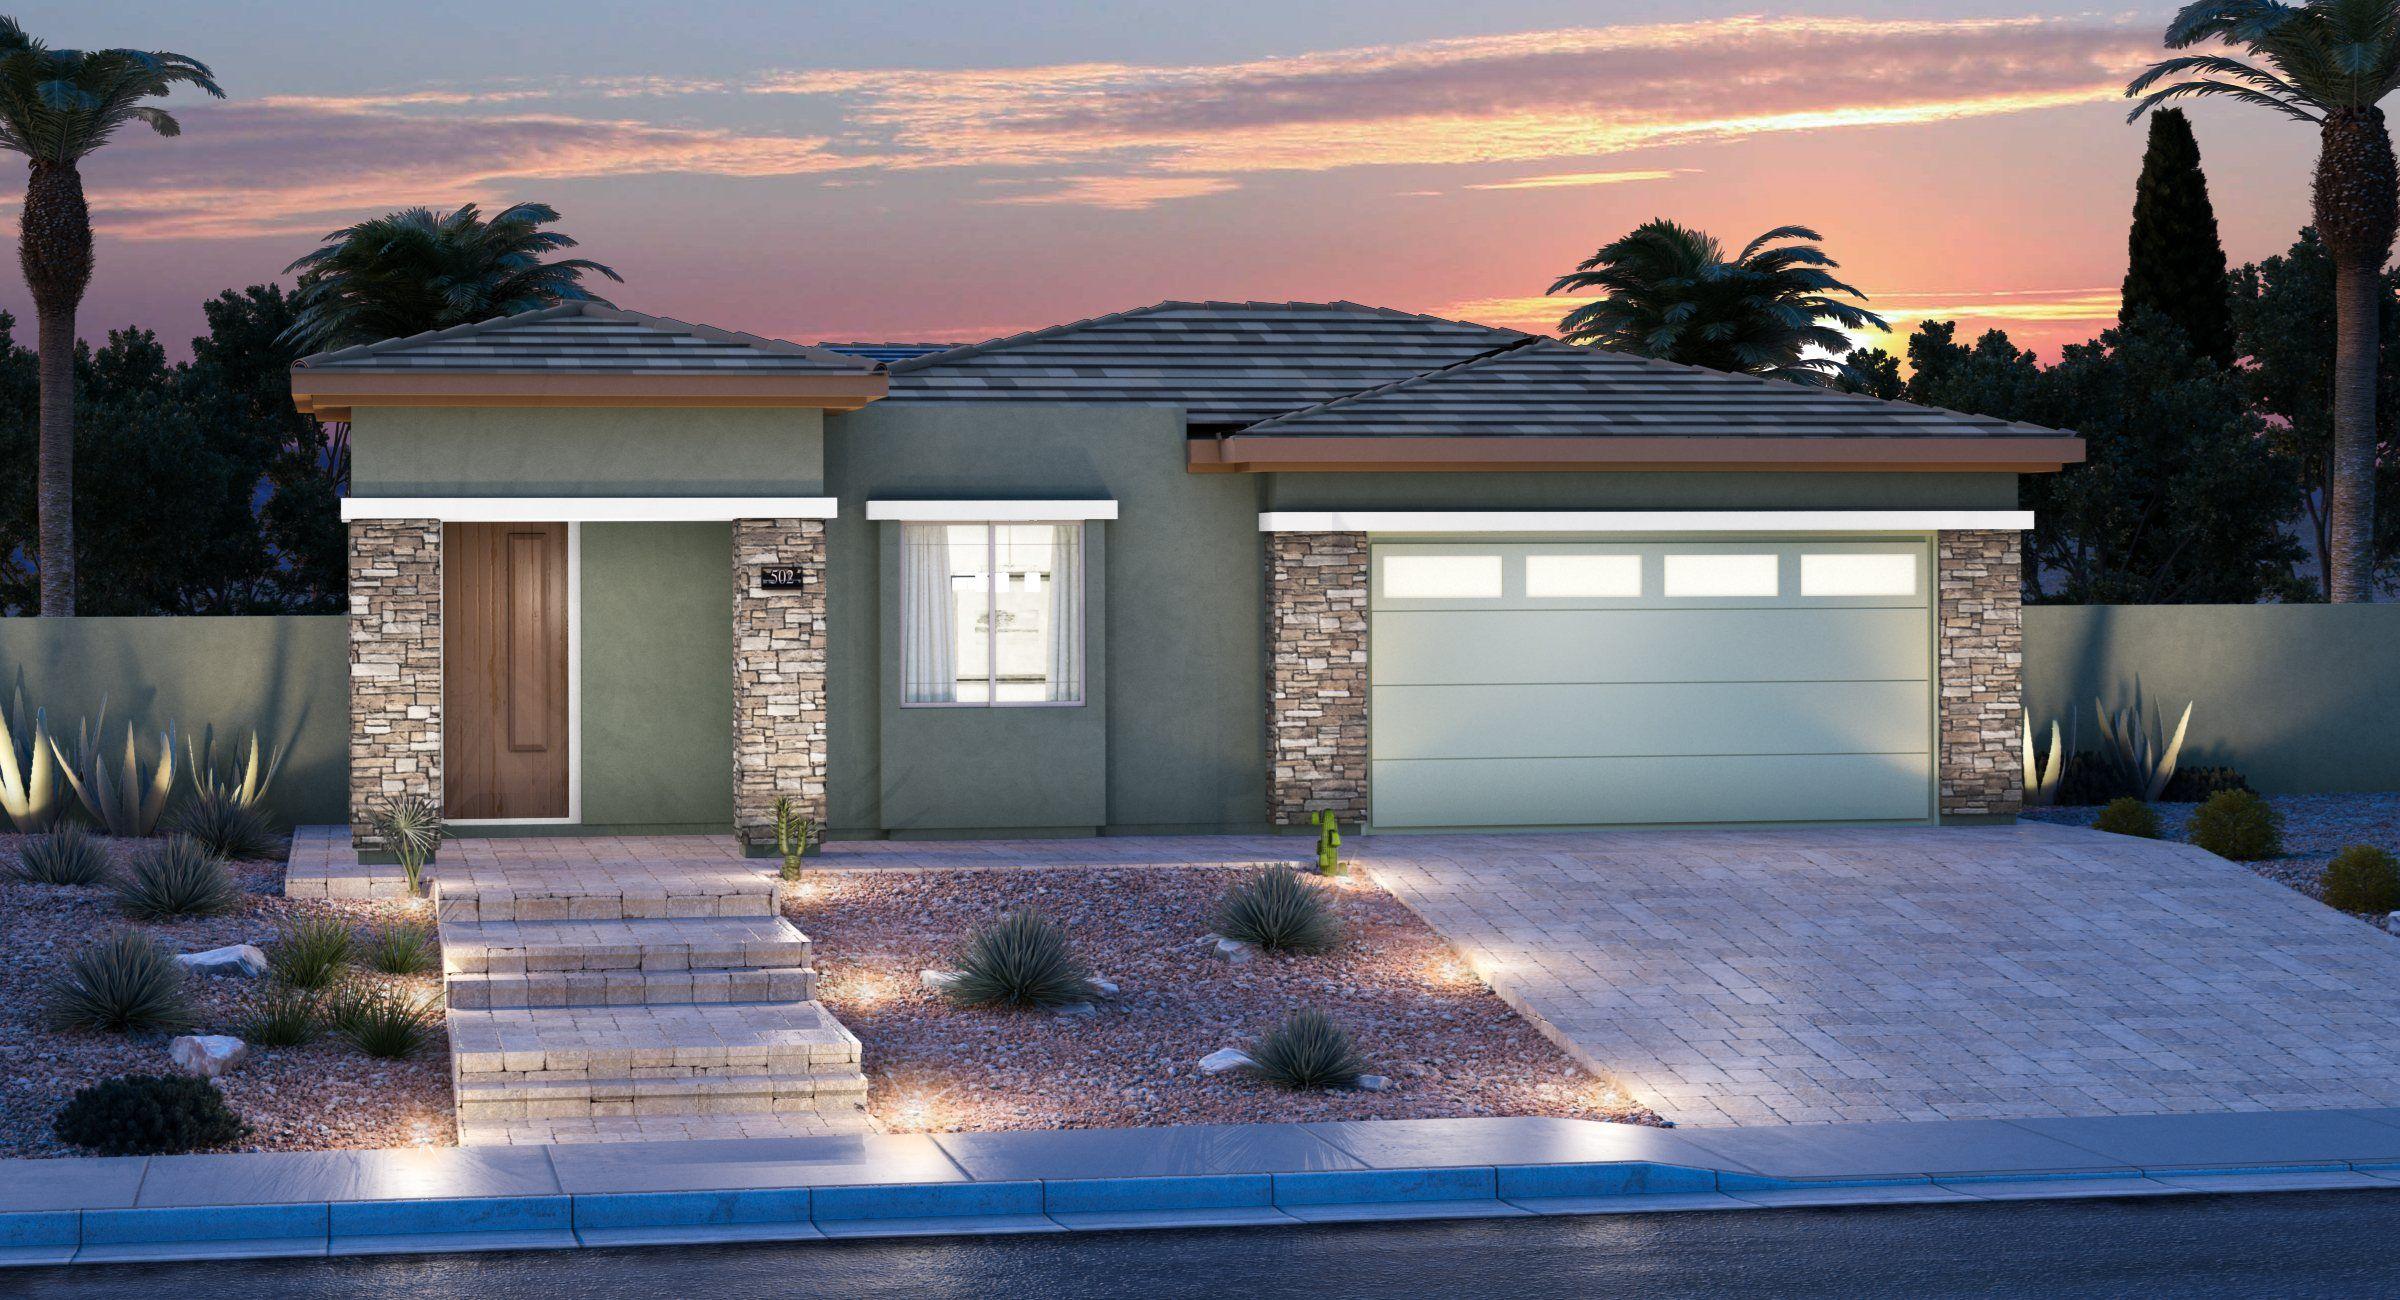 Royal-Design-at-Lake Las Vegas - The Outlook-in-Henderson